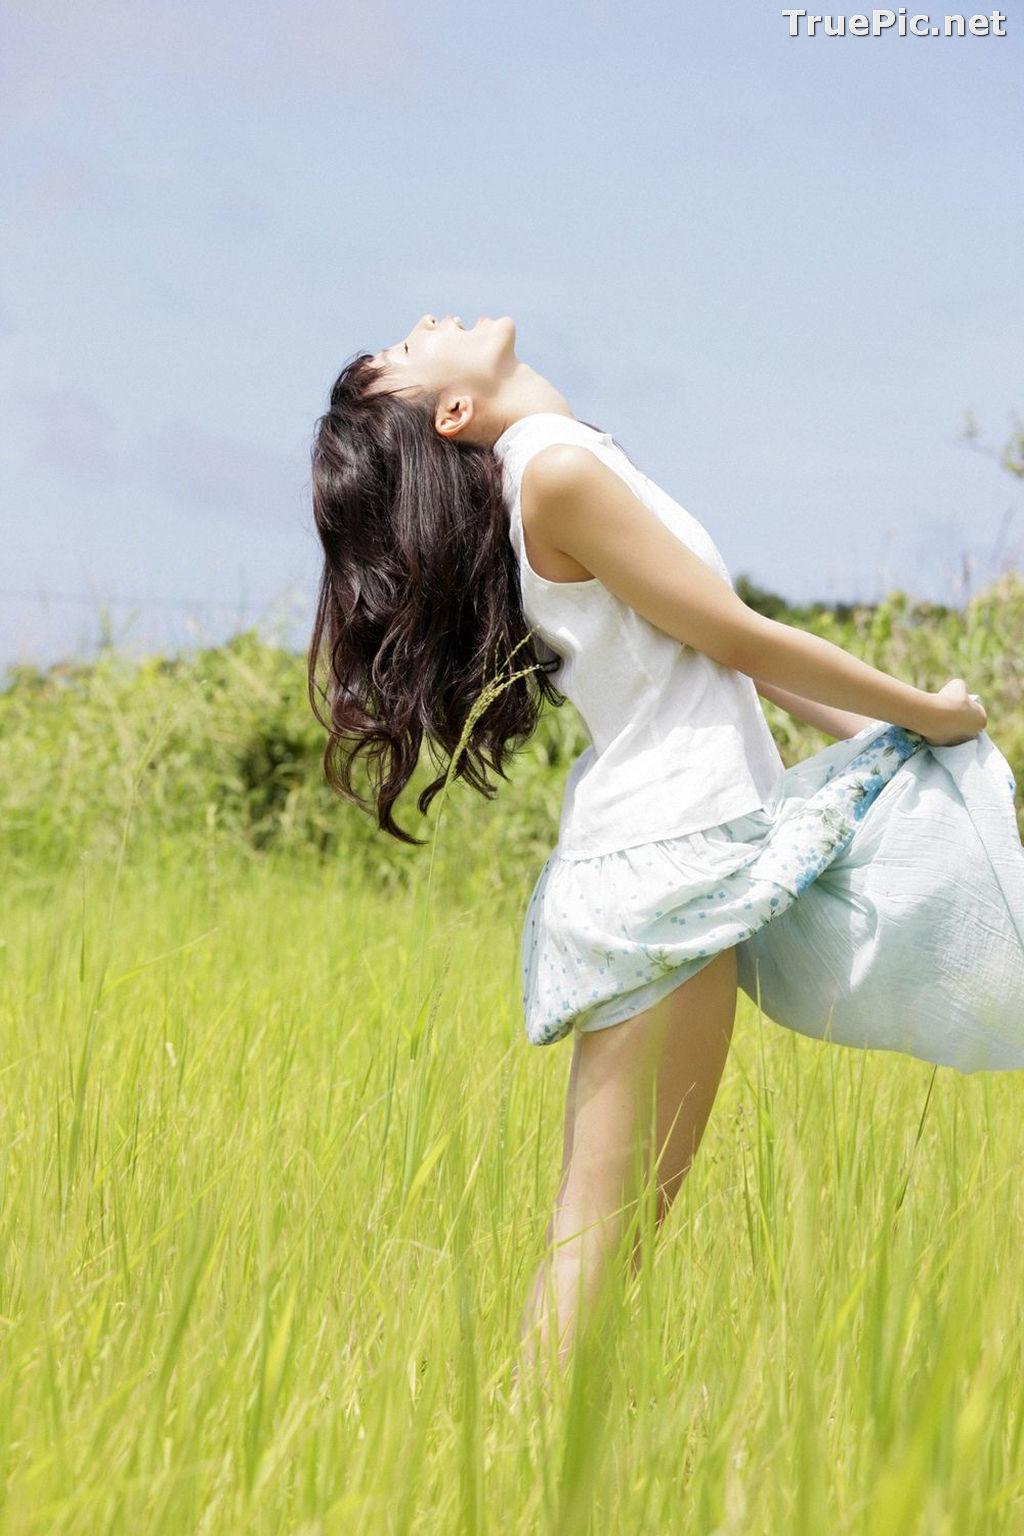 Image [YS Web] Vol.527 - Japanese Gravure Idol and Singer - Risa Yoshiki - TruePic.net - Picture-6